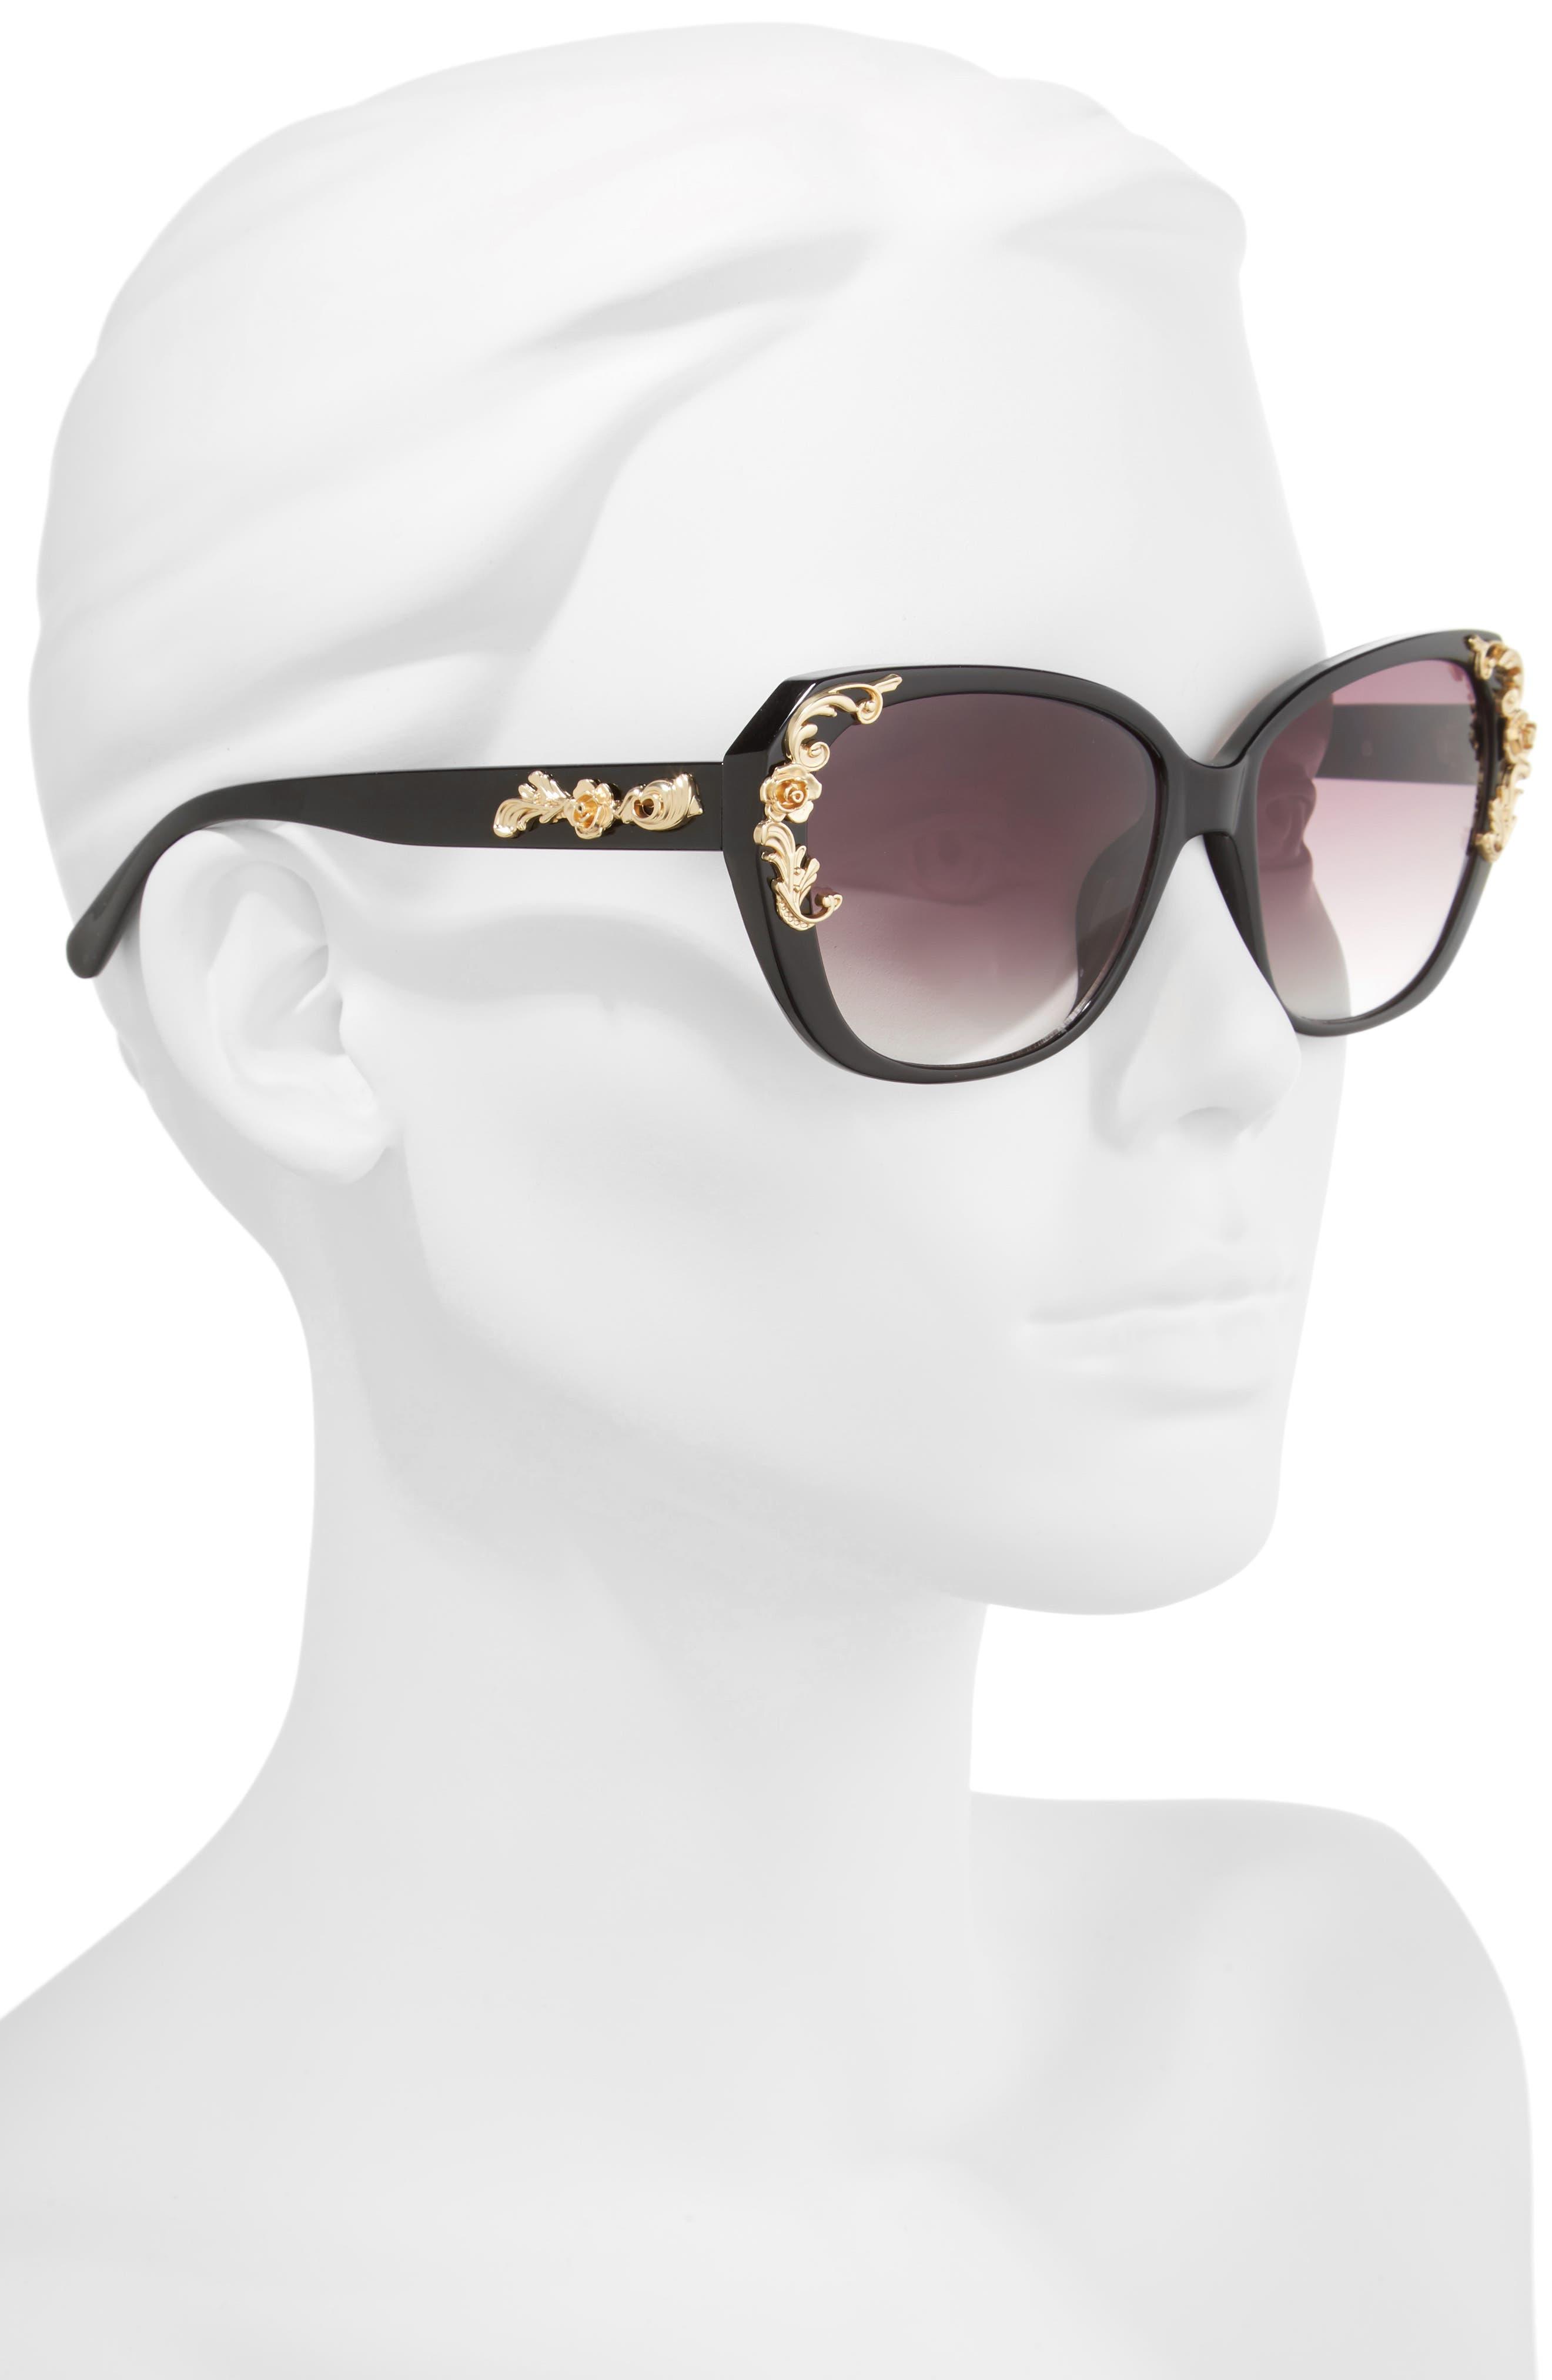 56mm Filigree Embellished Square Sunglasses,                             Alternate thumbnail 2, color,                             005